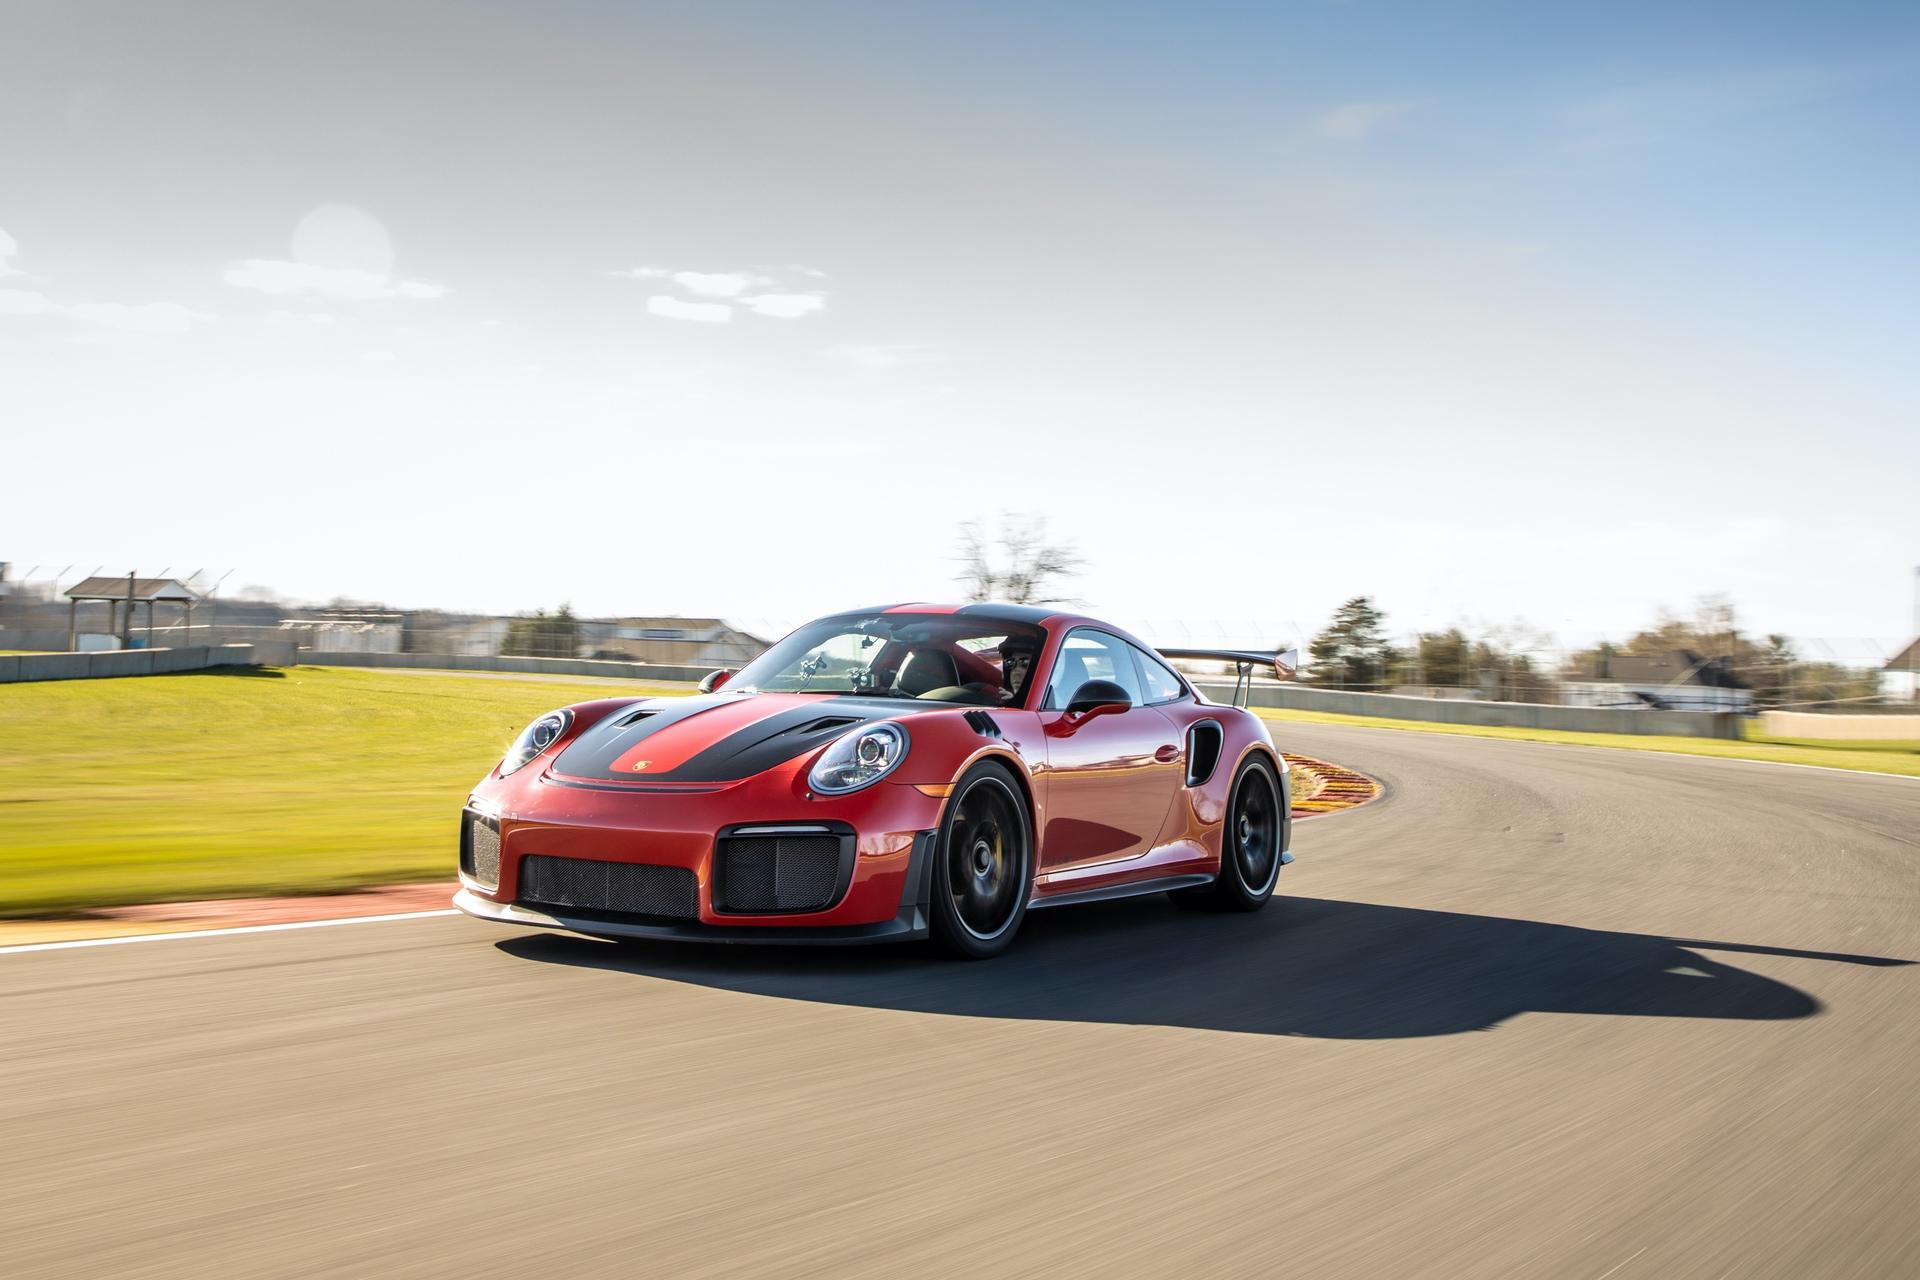 Porsche_911_GT2_RS_Road_America_0010